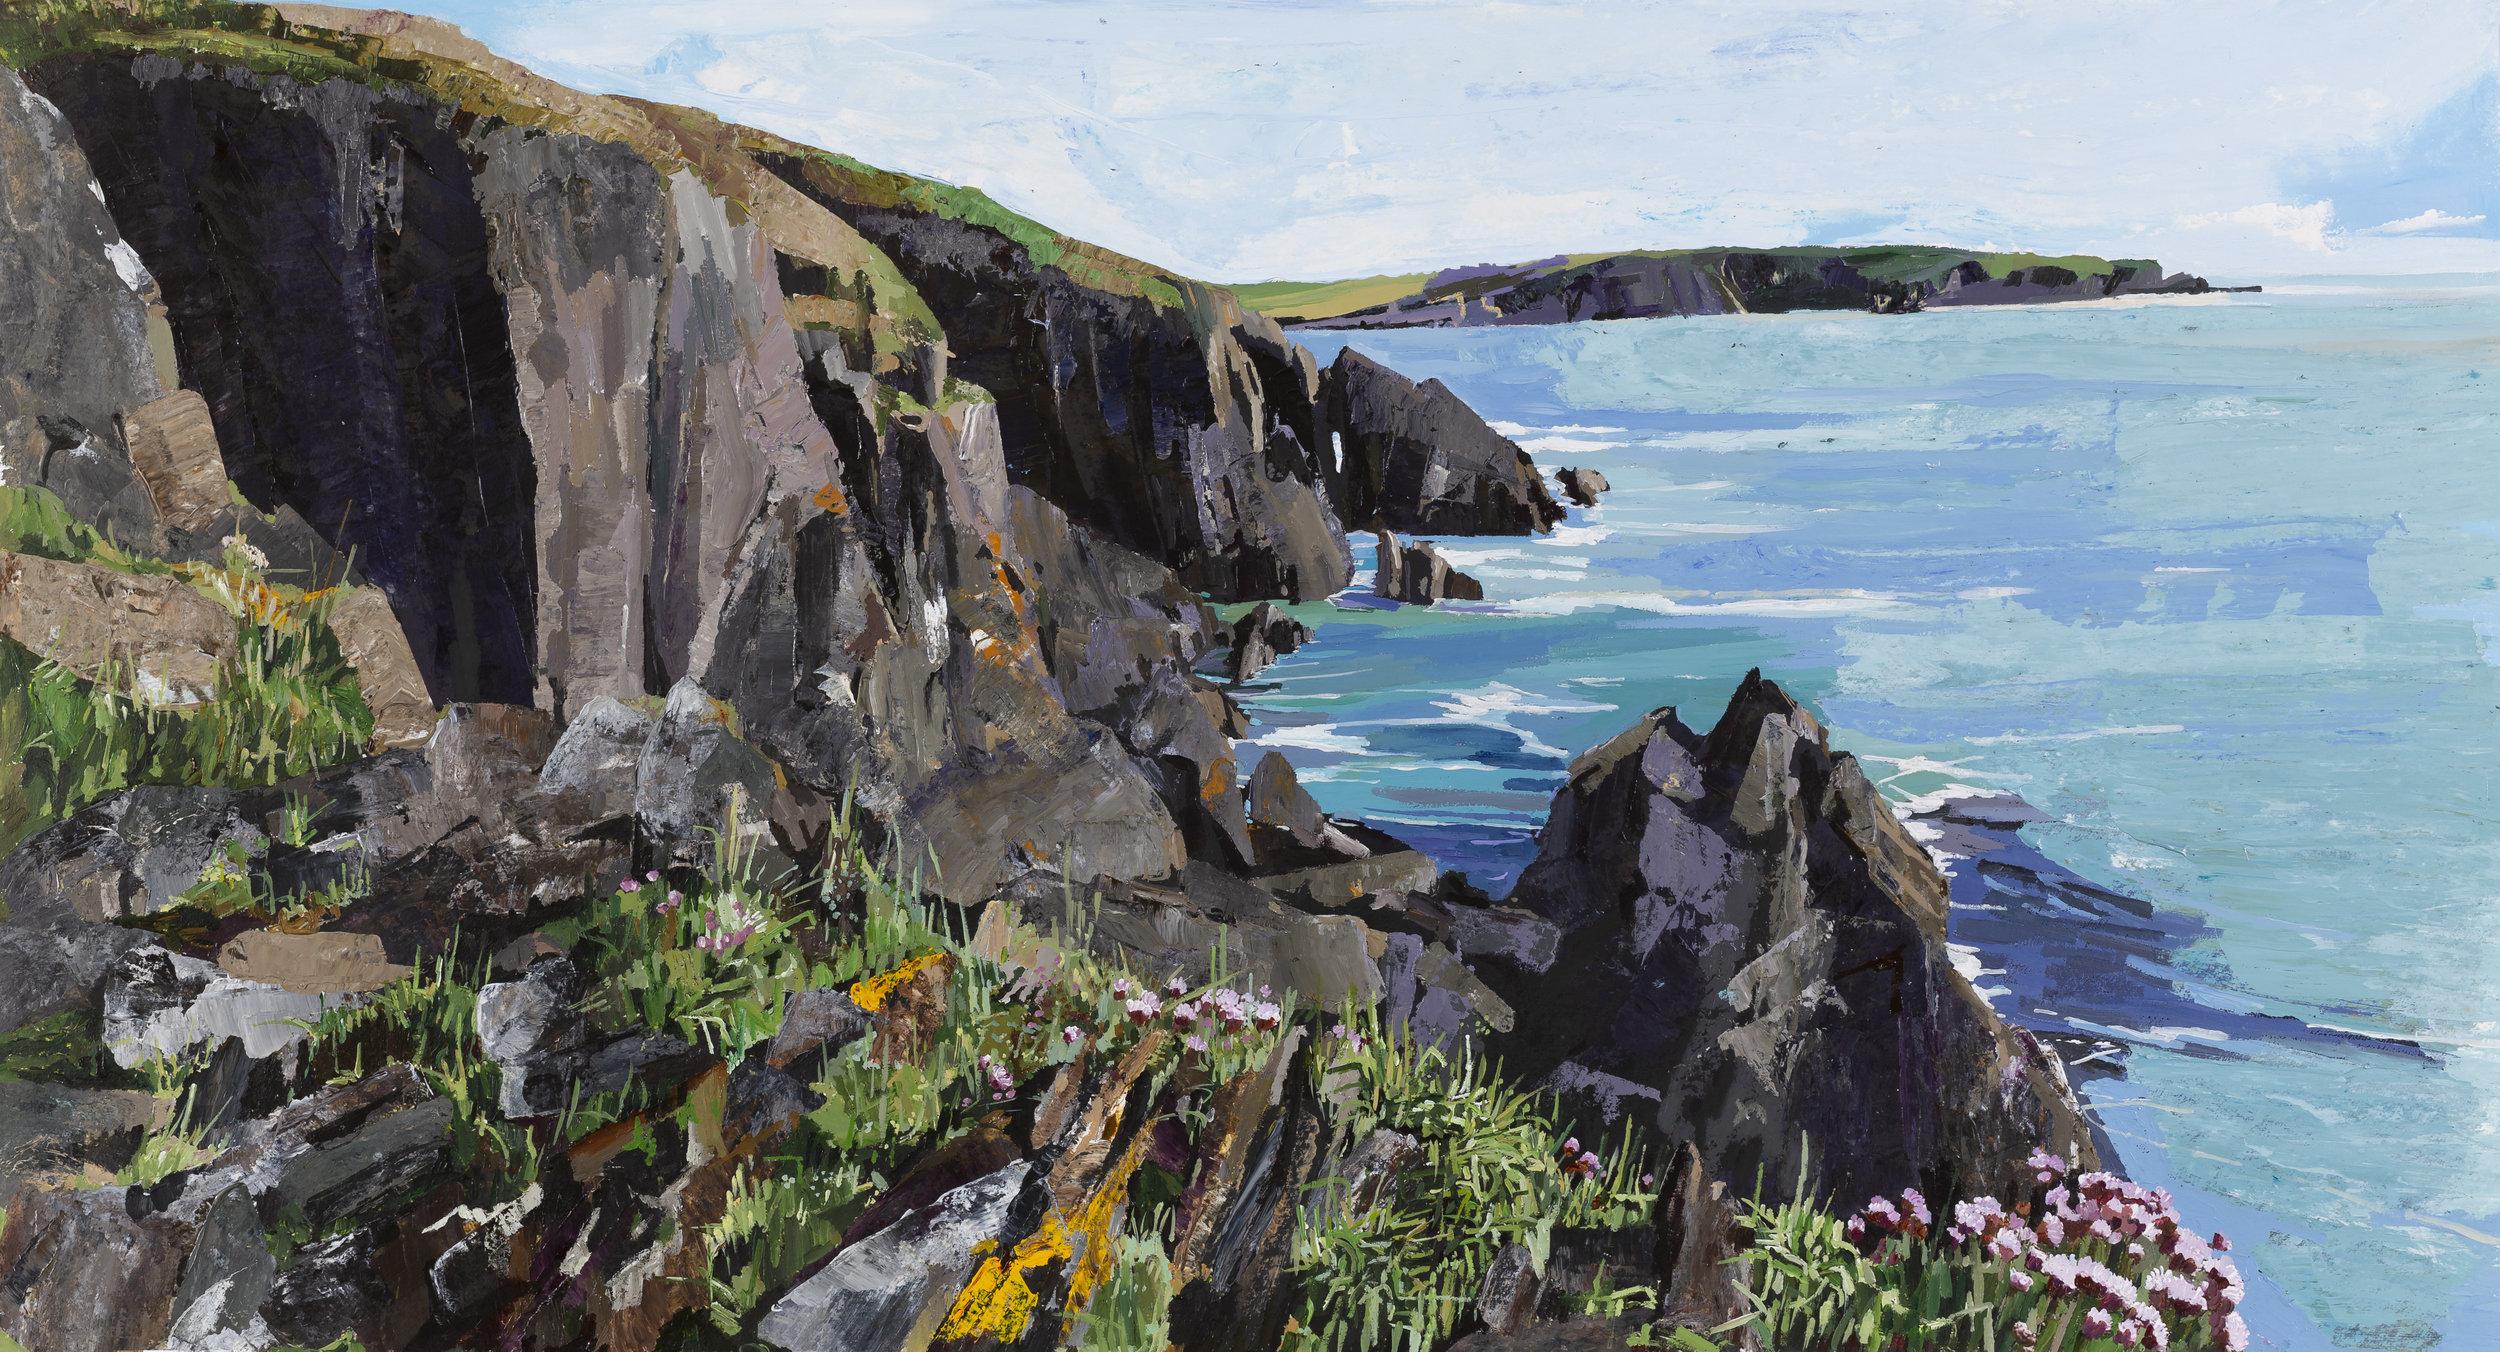 Cliff Rambling near Dirk Bay, Galley Head. West Cork Art.